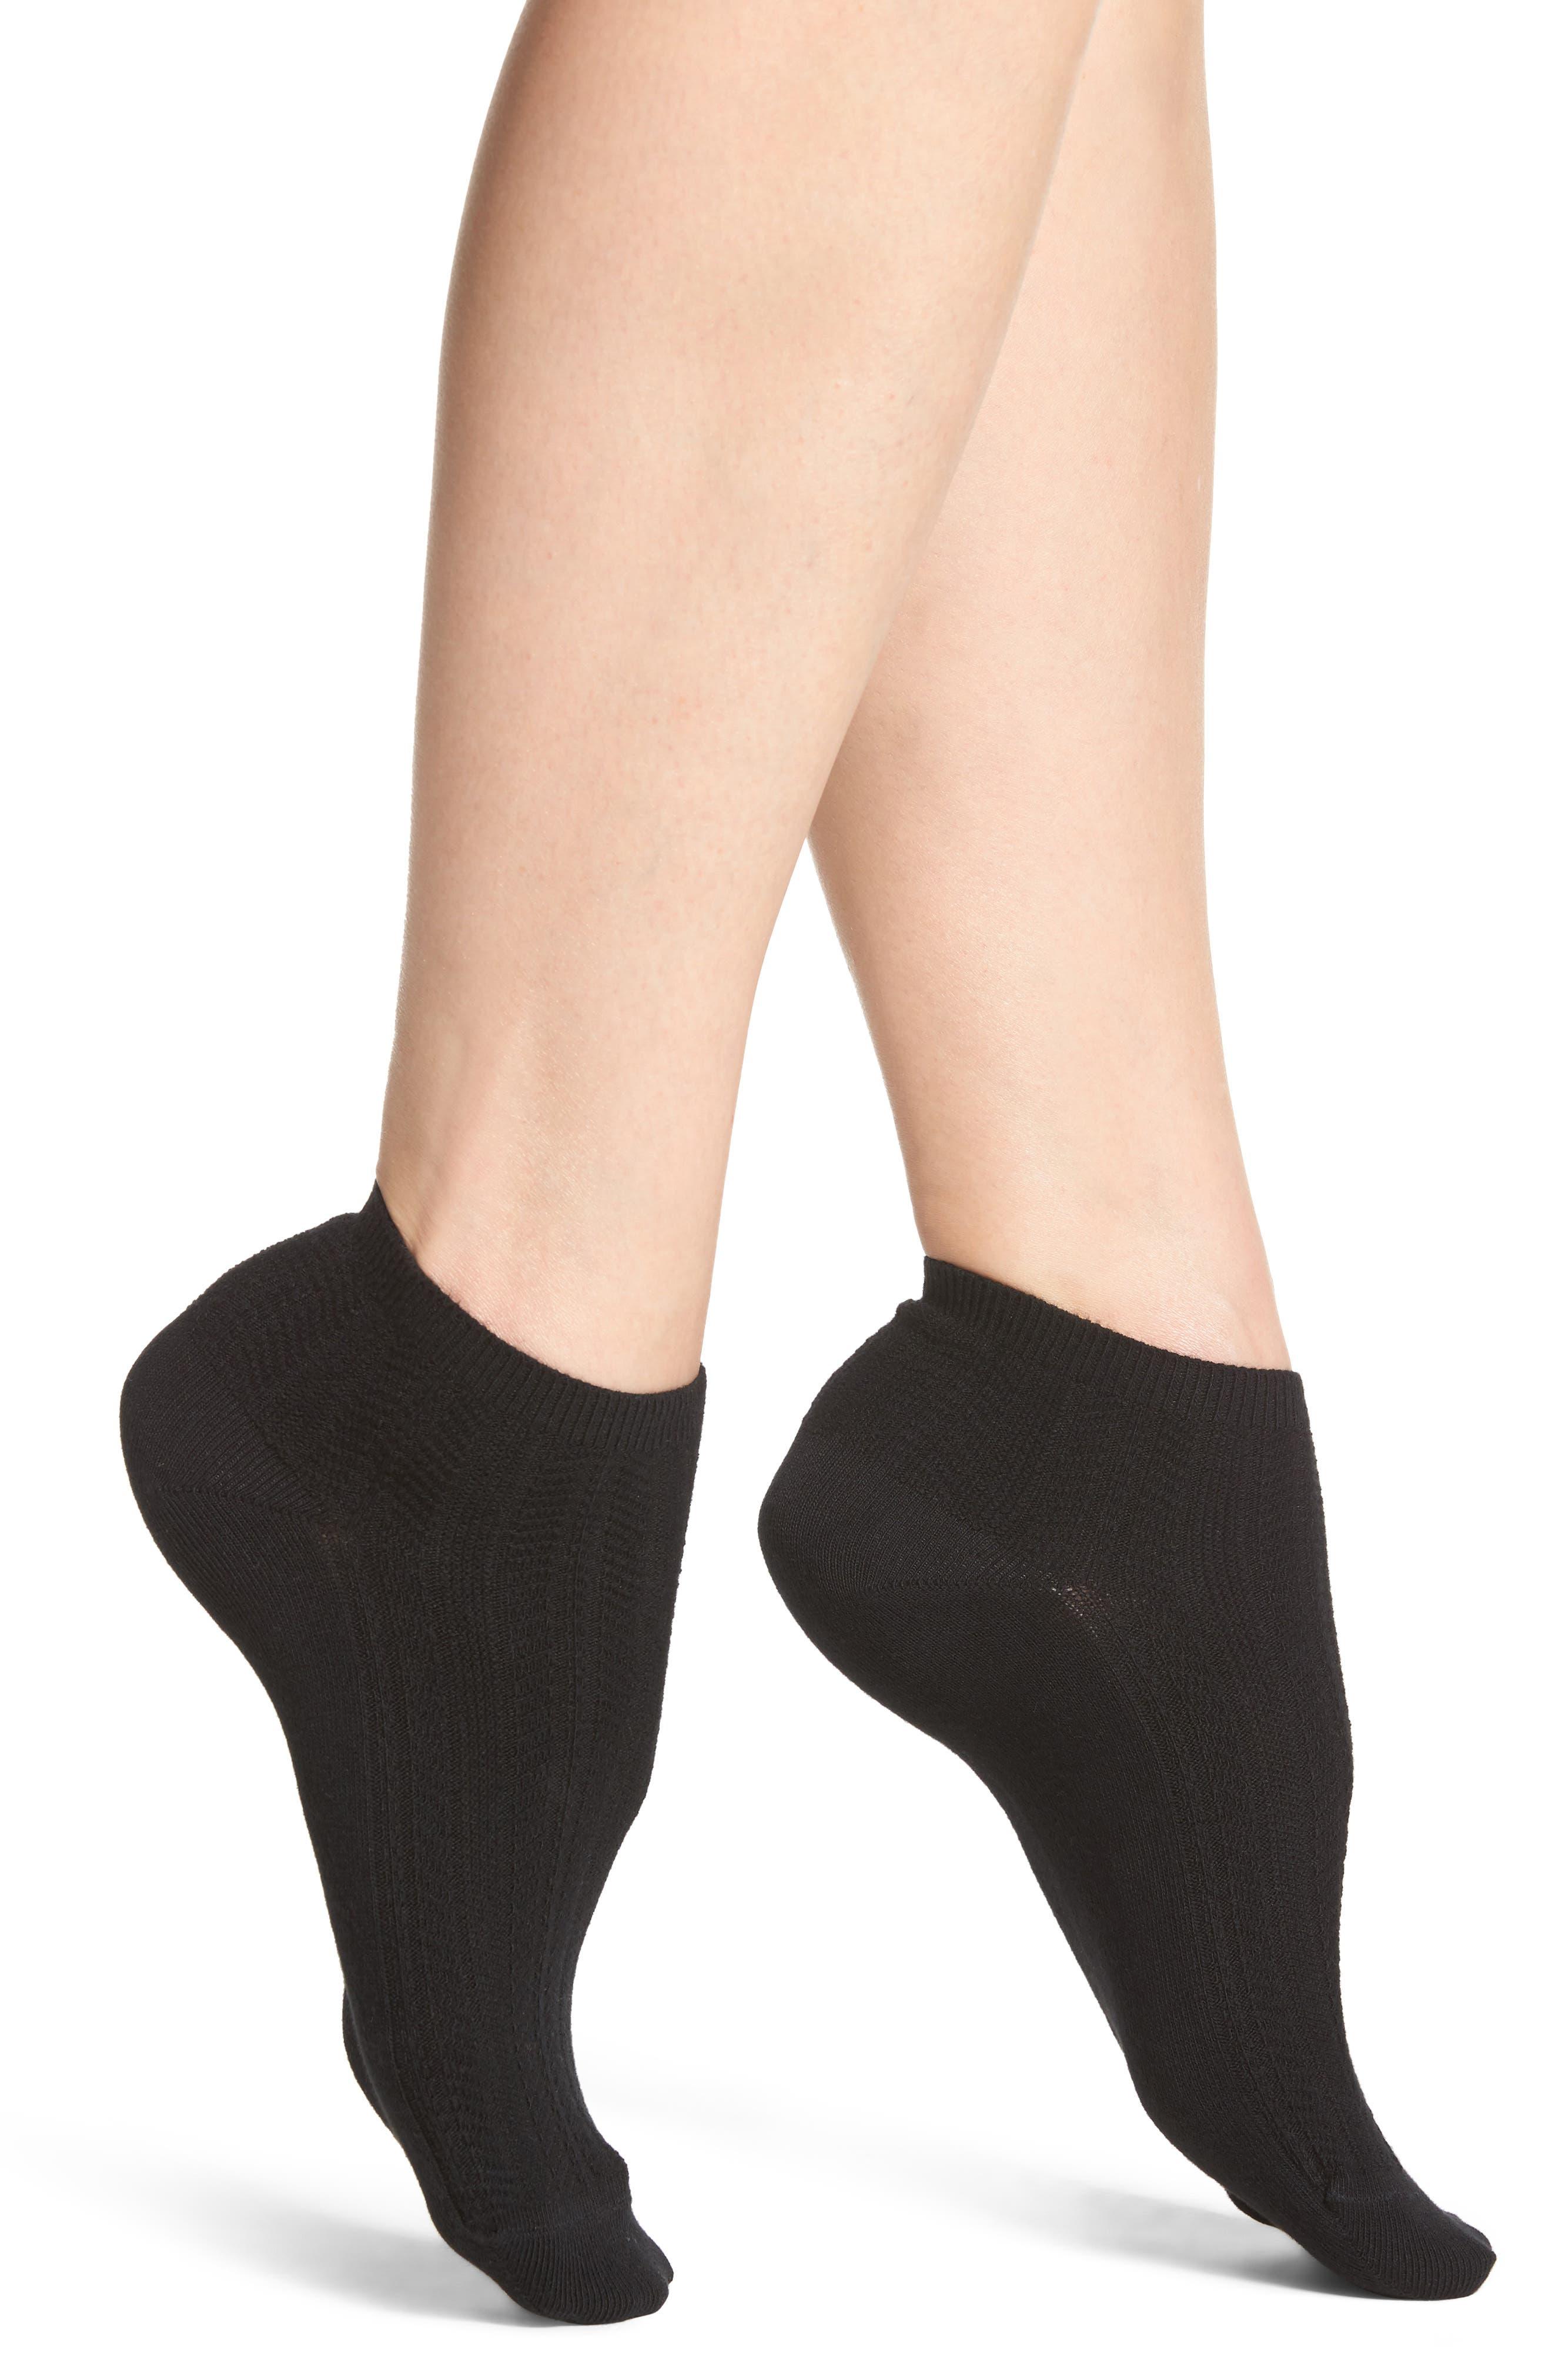 Knit Ankle Socks,                         Main,                         color, 001